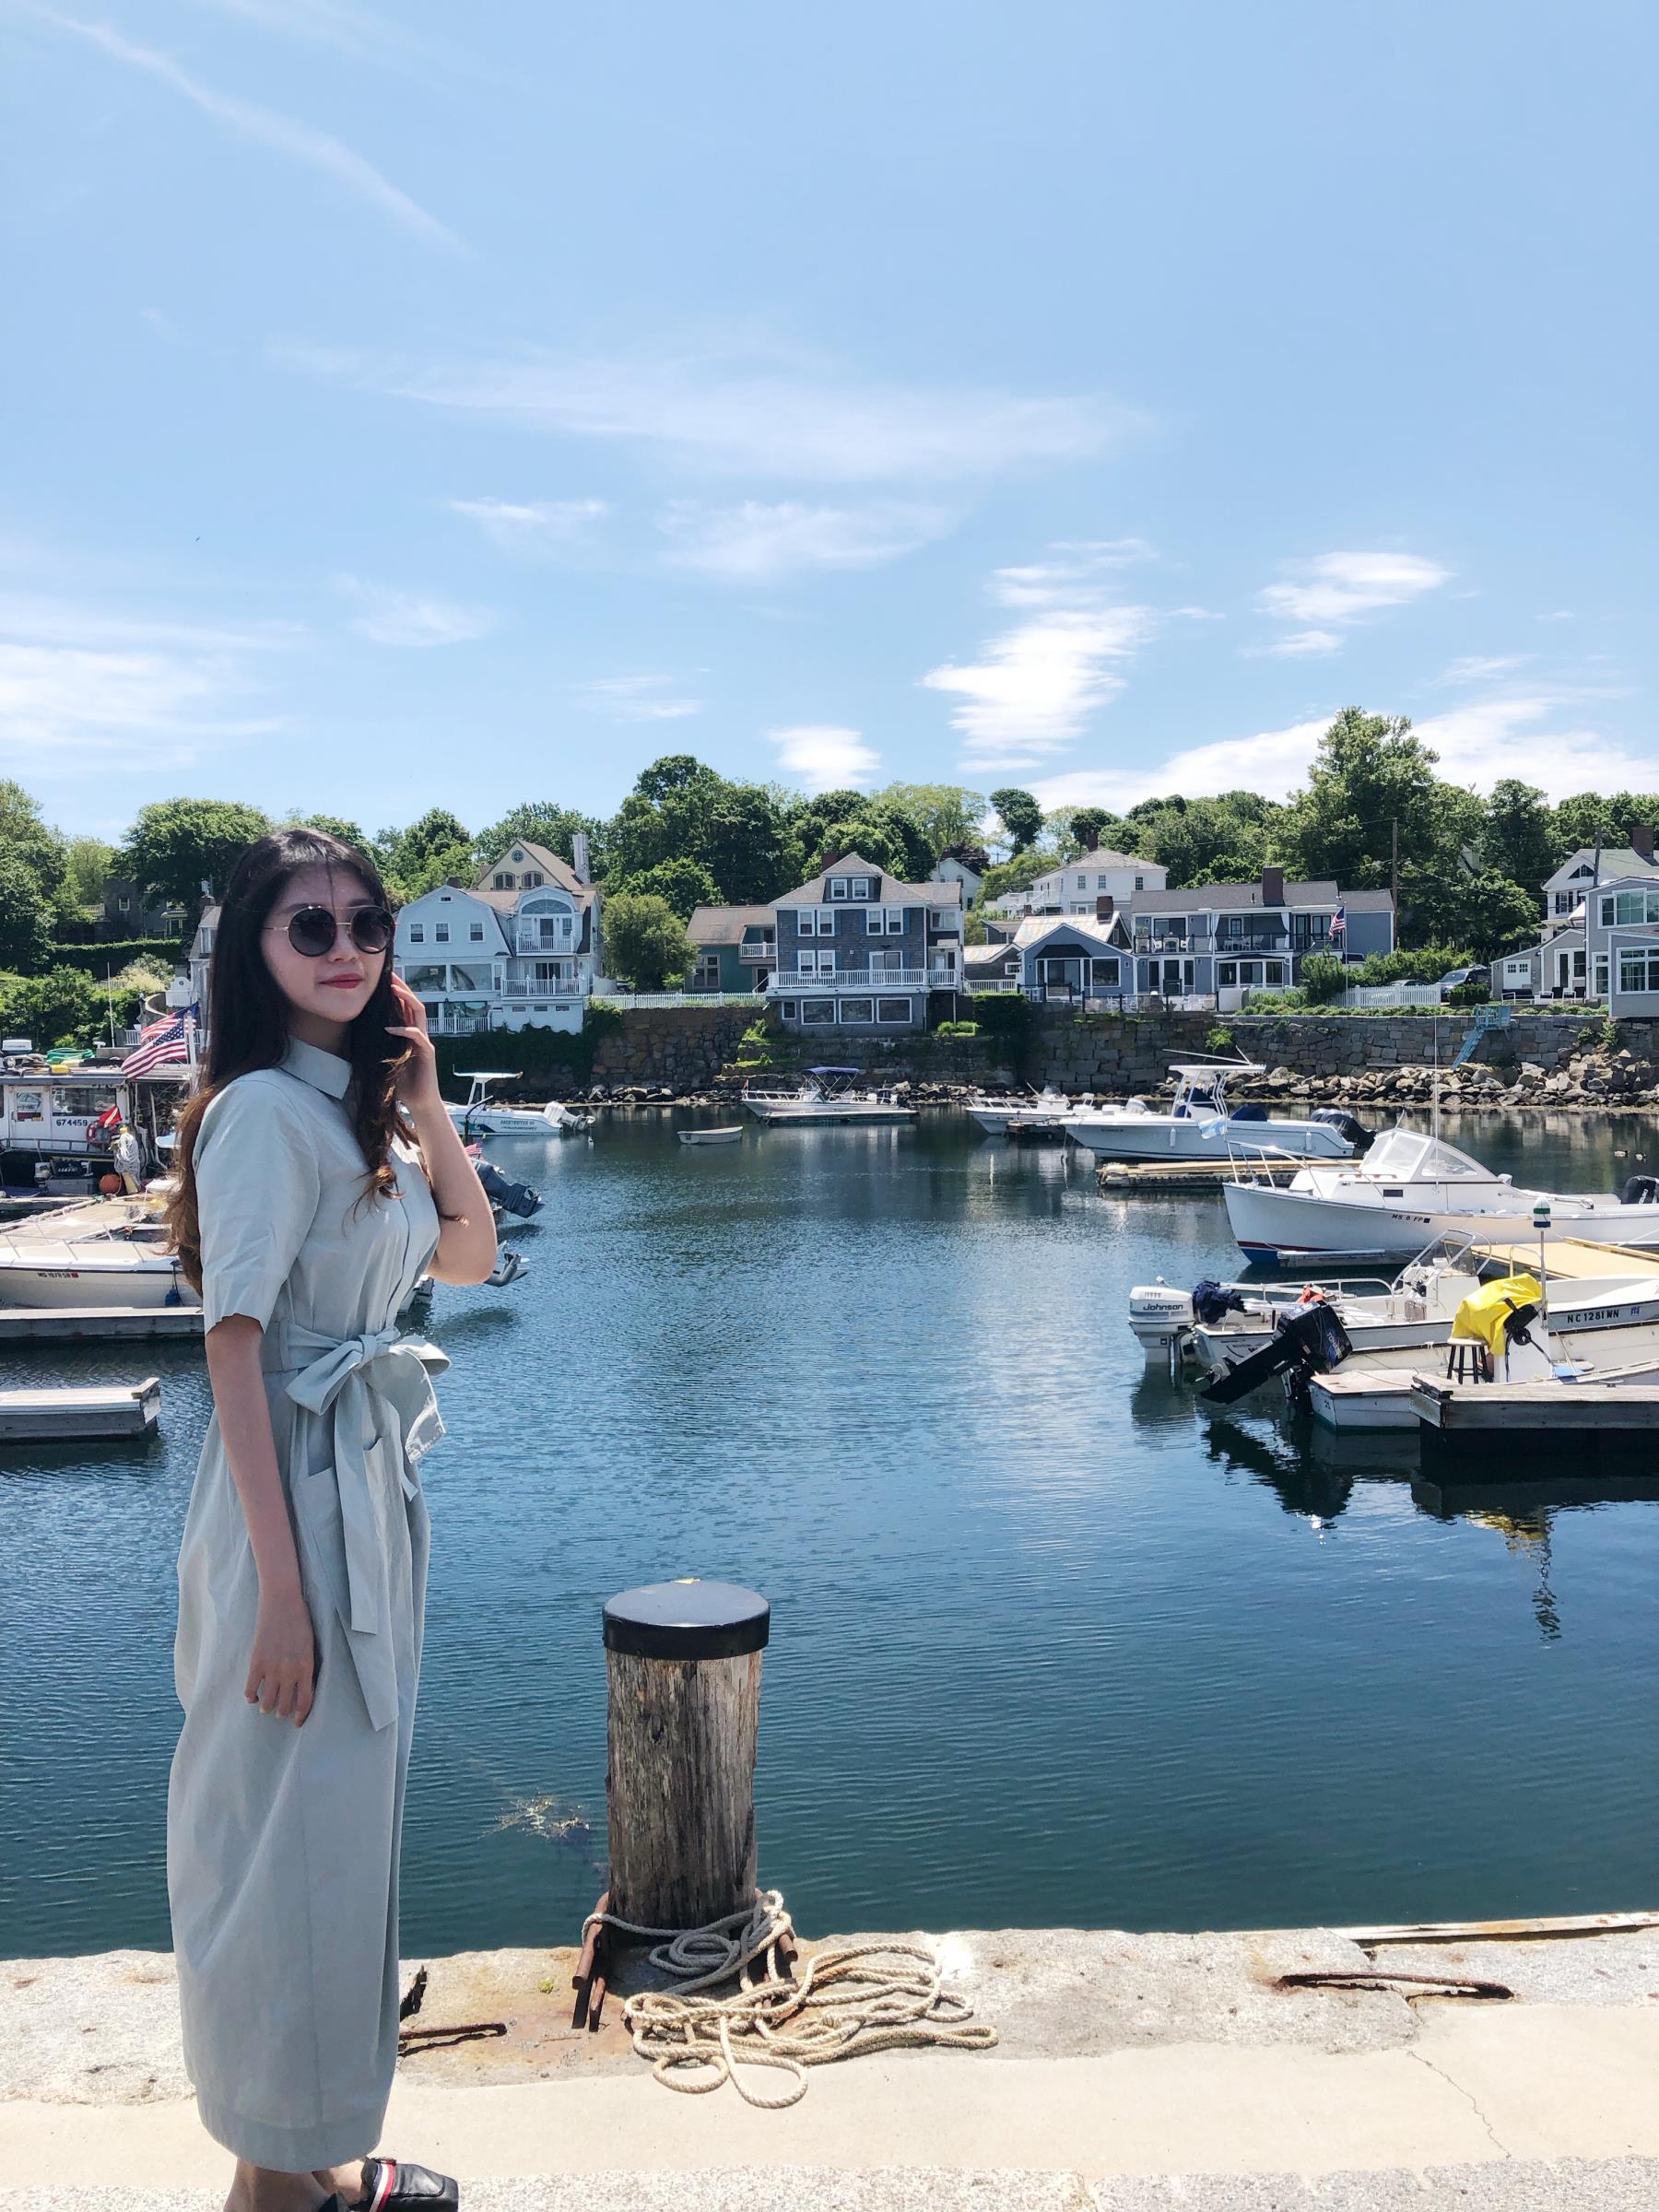 Jing at the docks